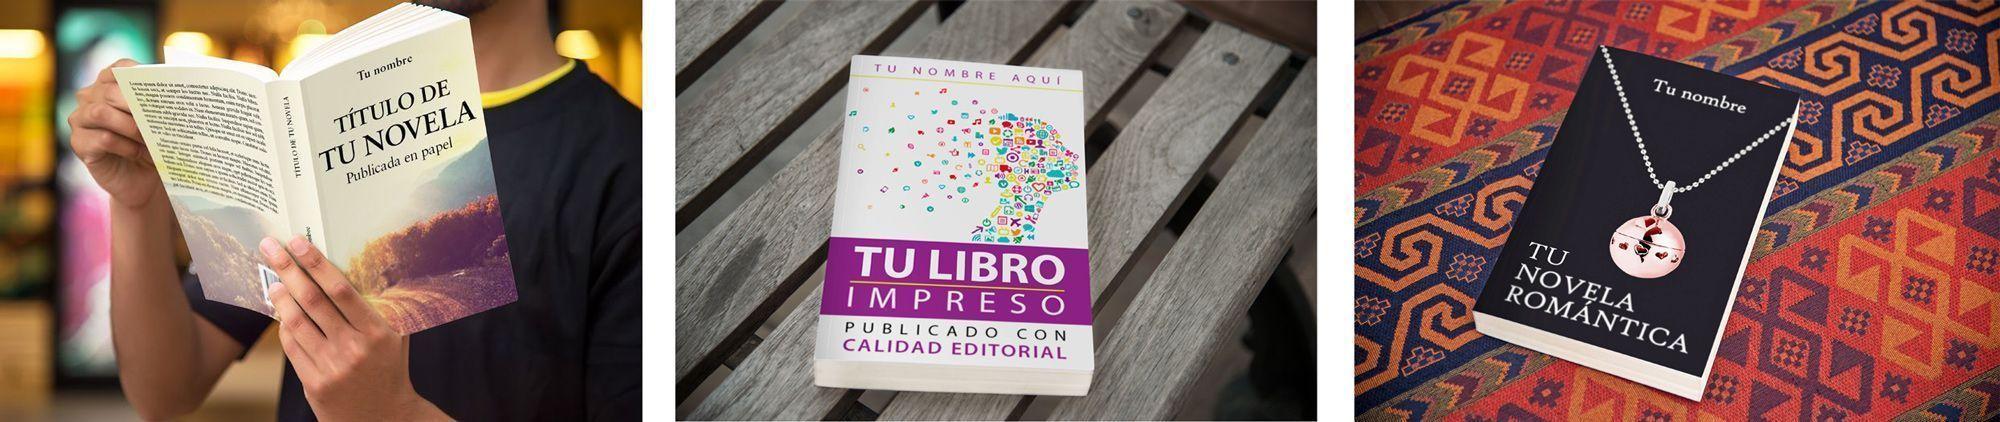 publica-tu-libro-en-createspace-marianaeguaras